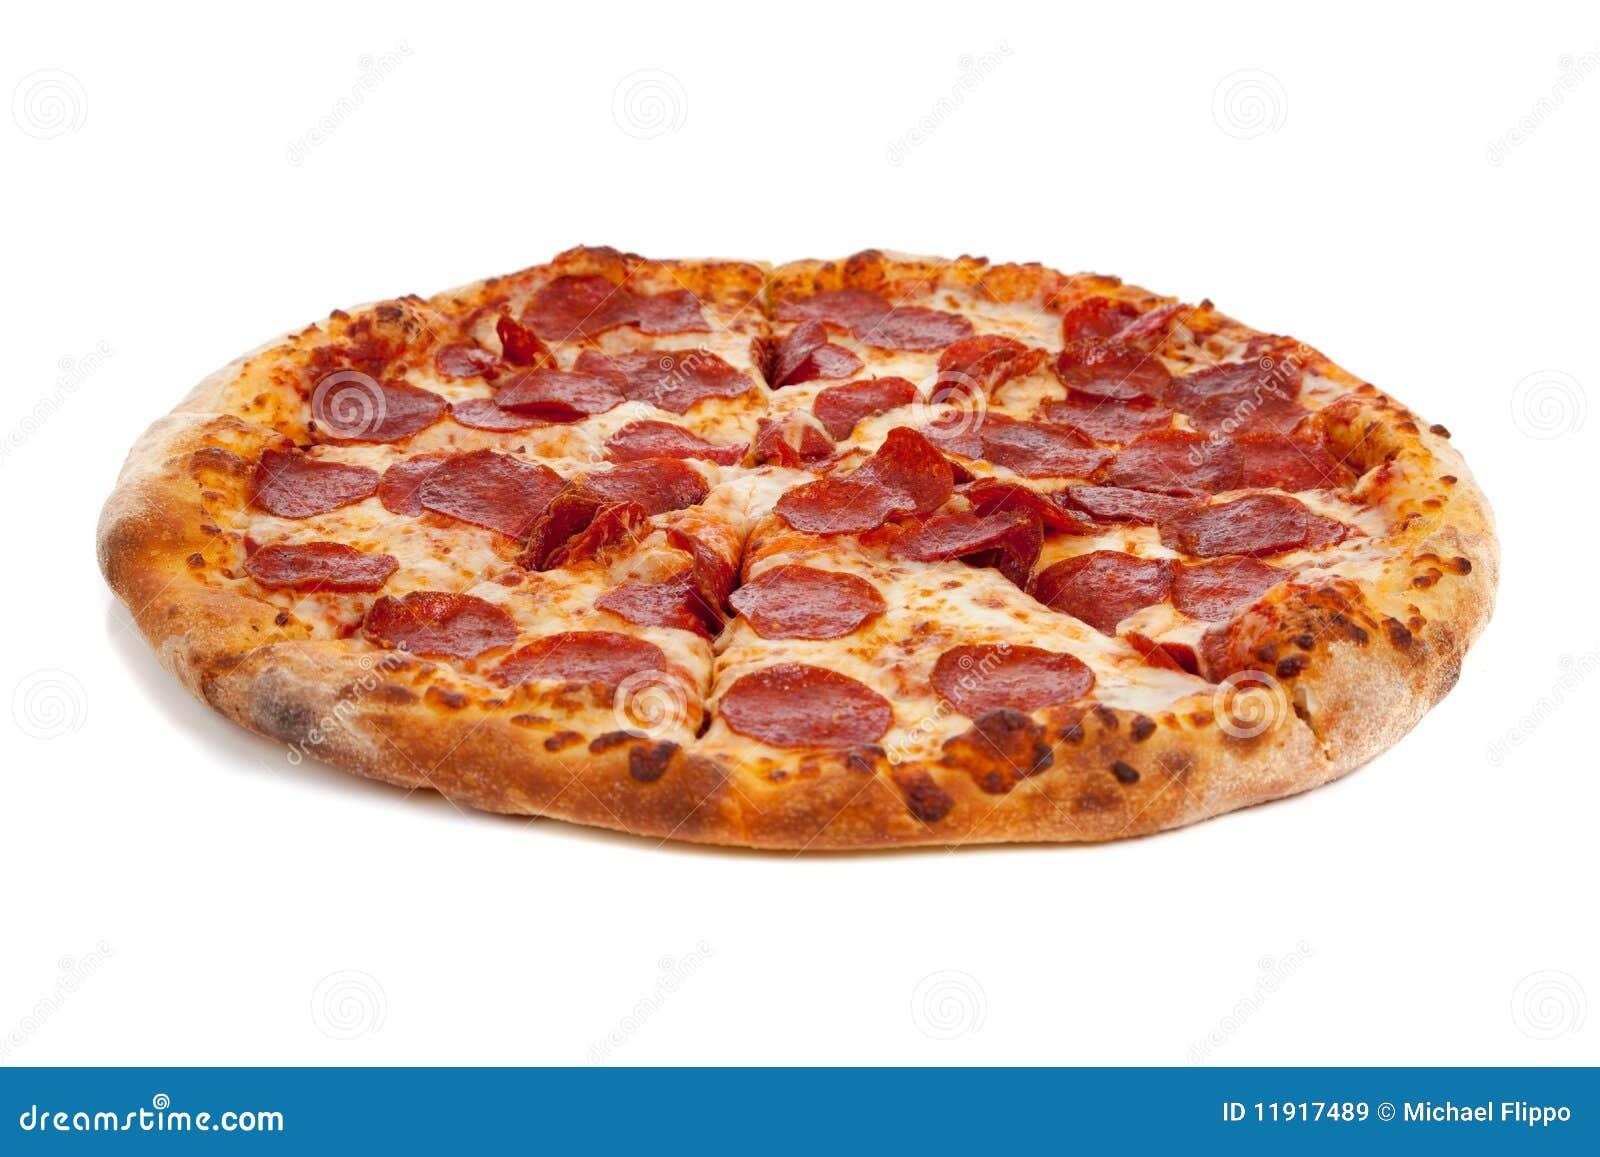 Pepperoni pizza on white